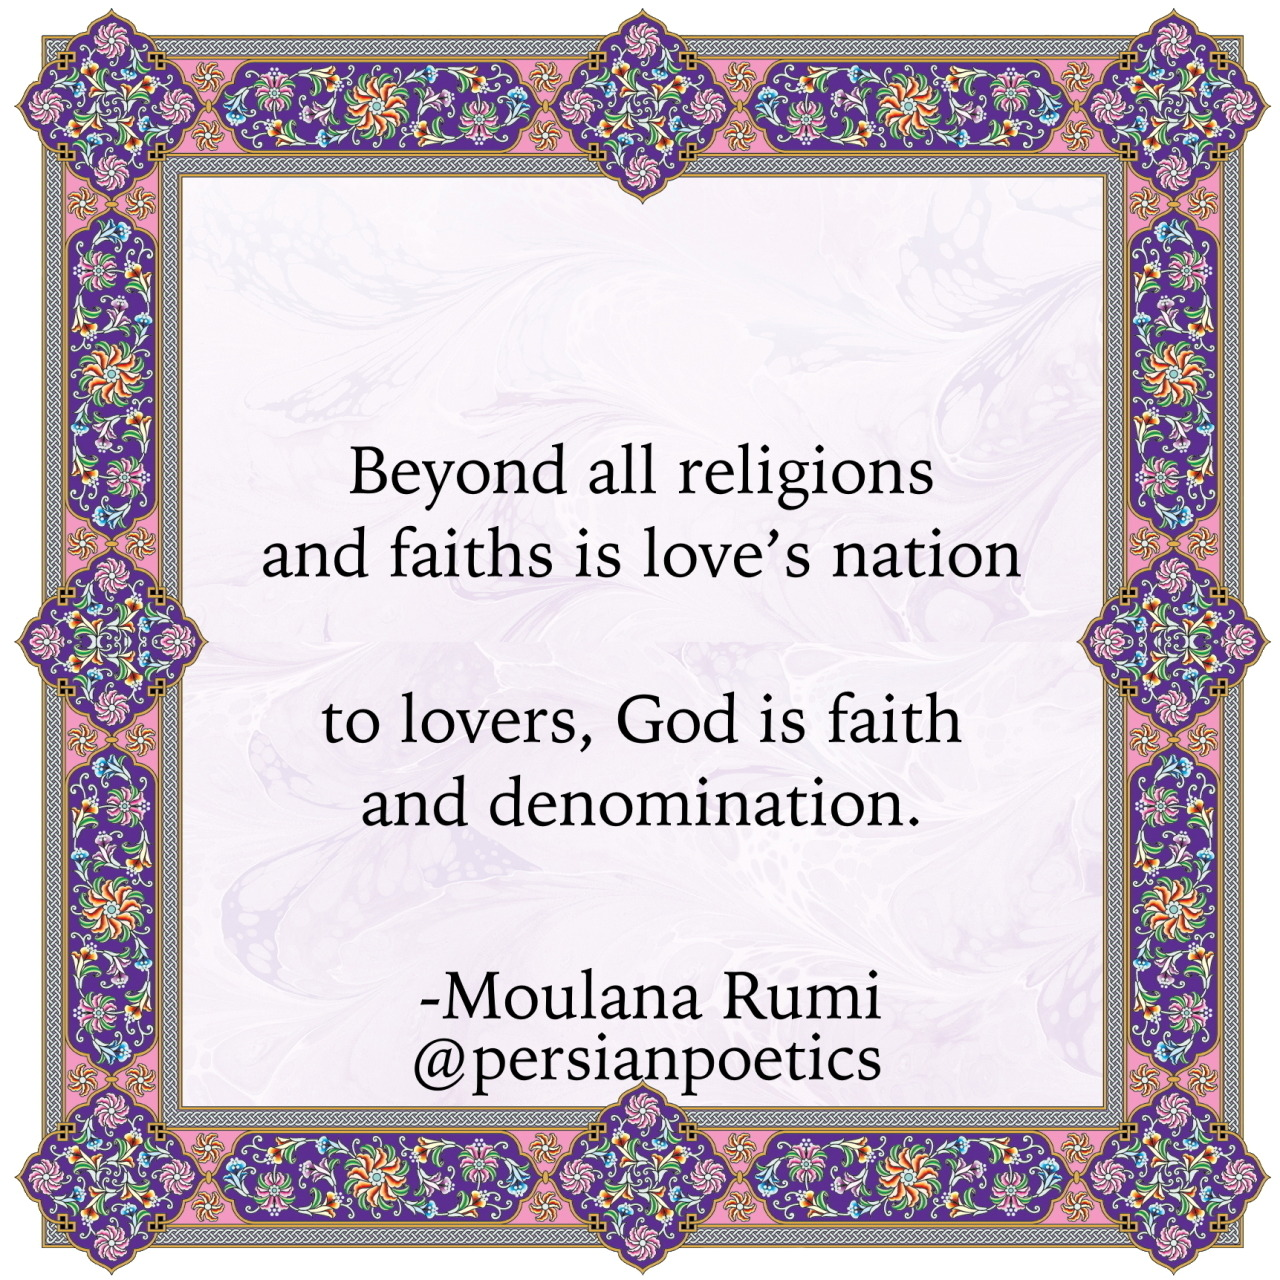 Moulana Muhammad Jalaluddin Rumi, rumi,Muhammad Jalaluddin Rumi,persian poetry,poetry,english translation